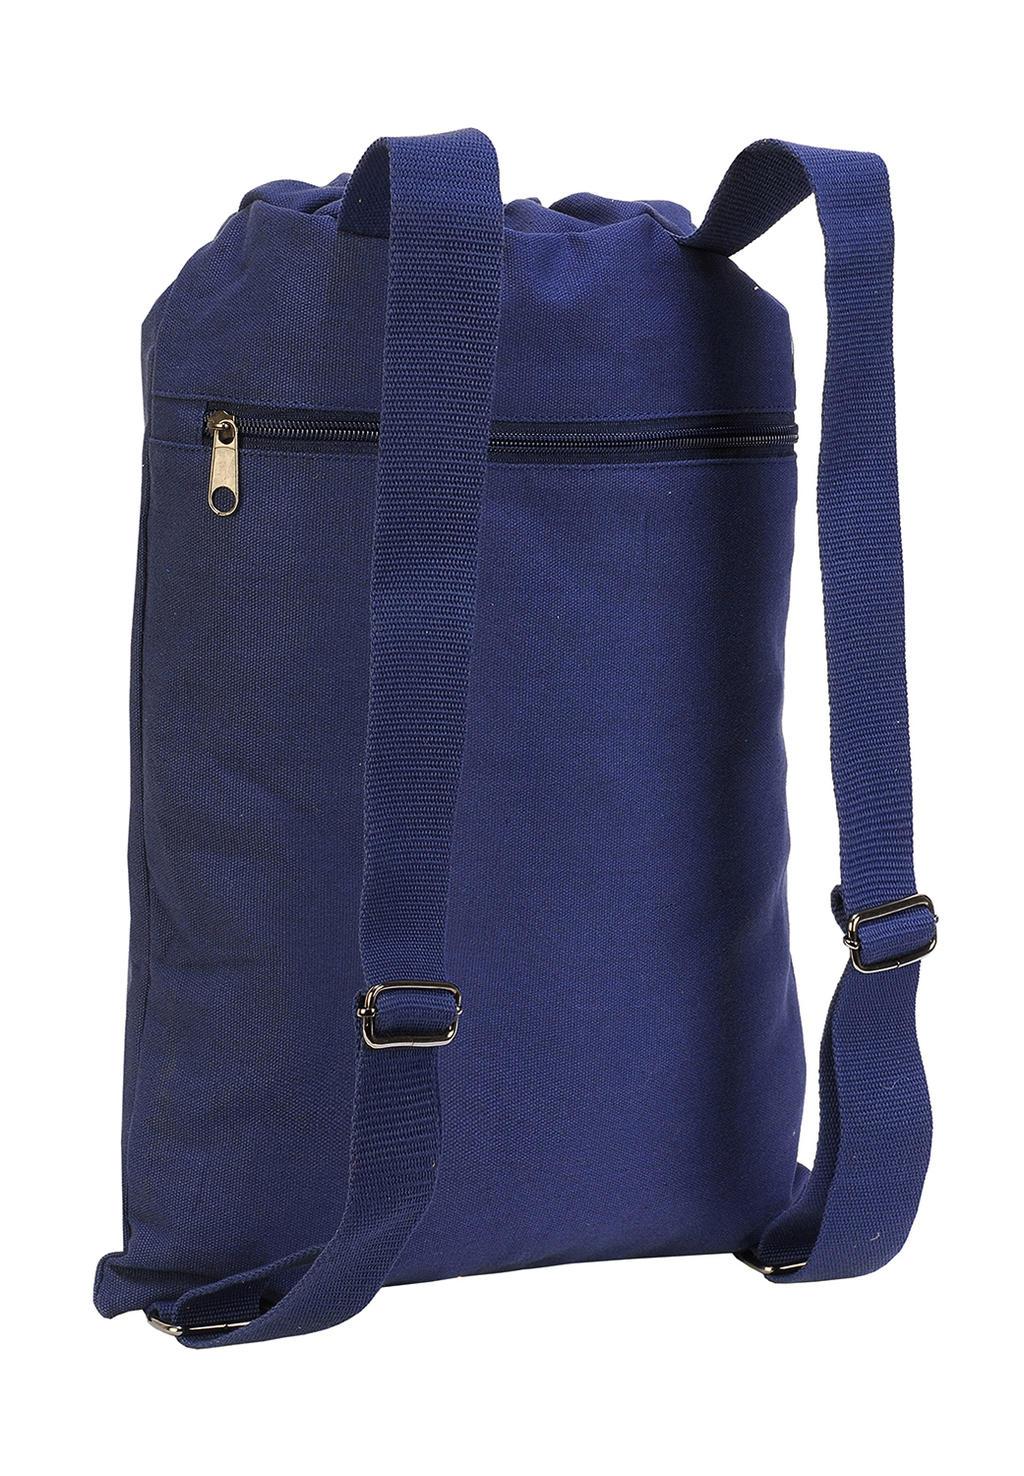 2aafddbf9 Bolsa-mochila de algodón Sheffield